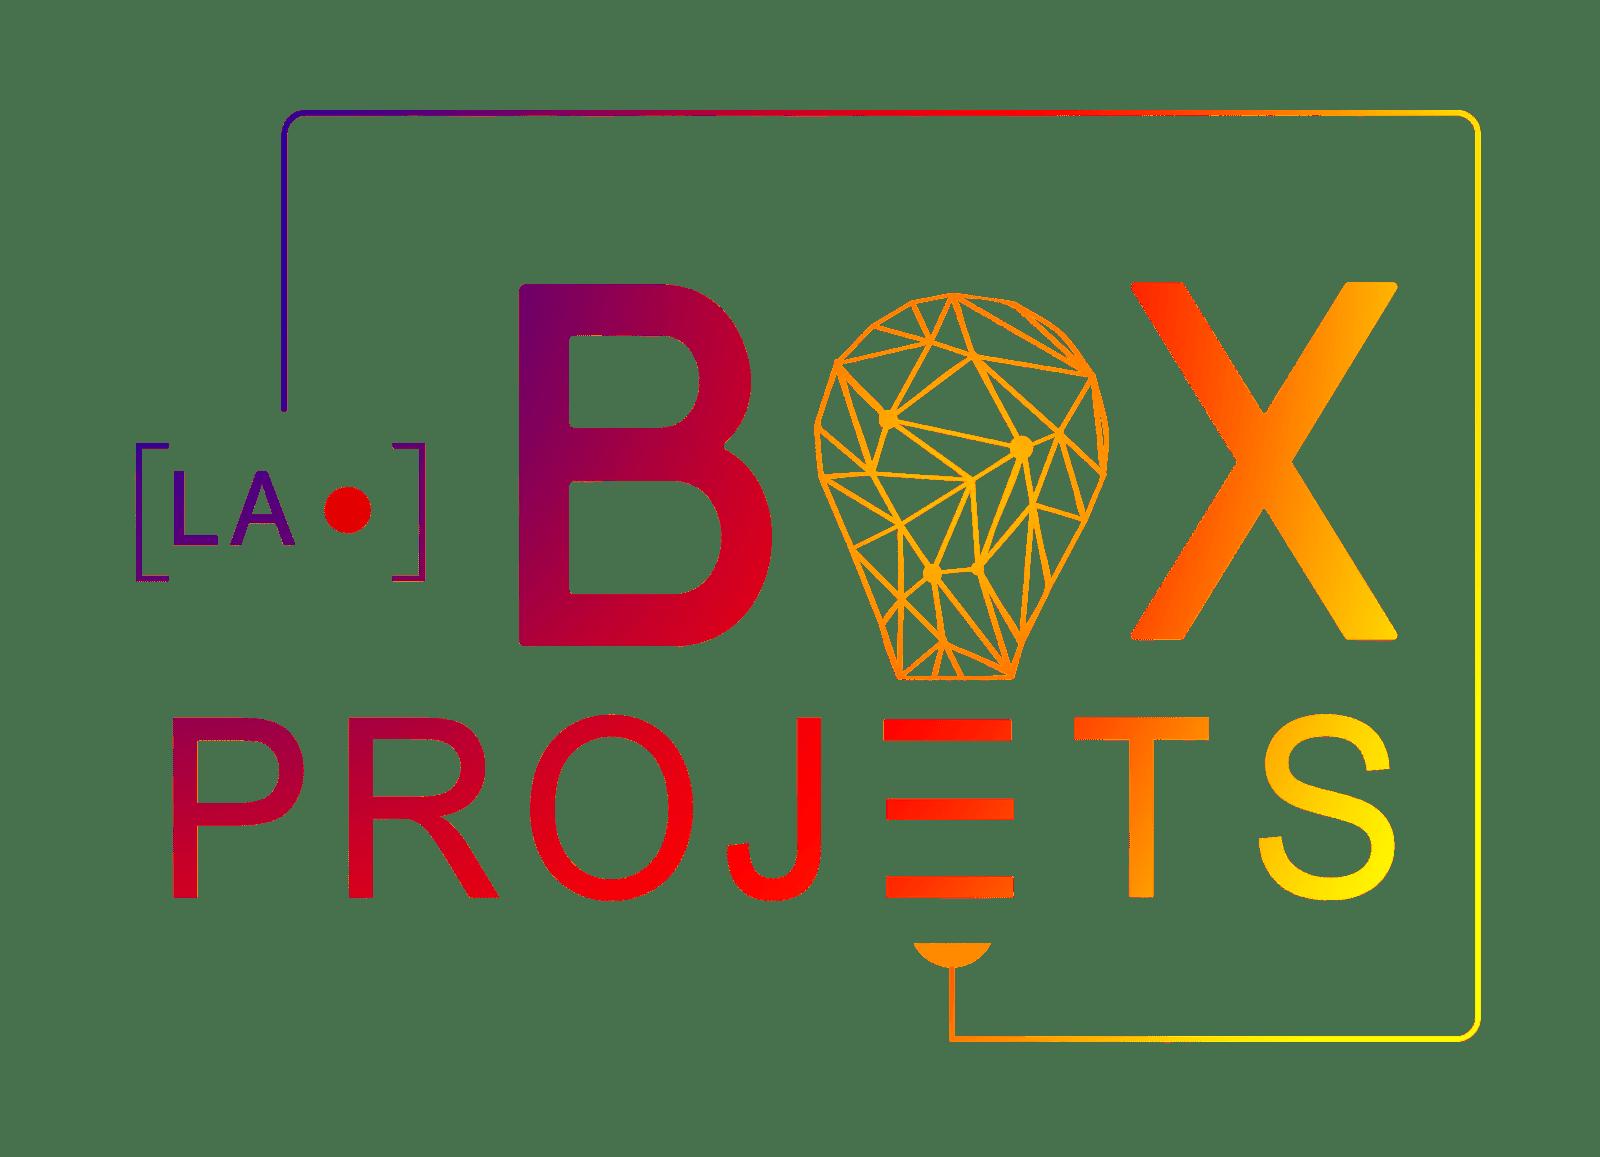 La Box Projets